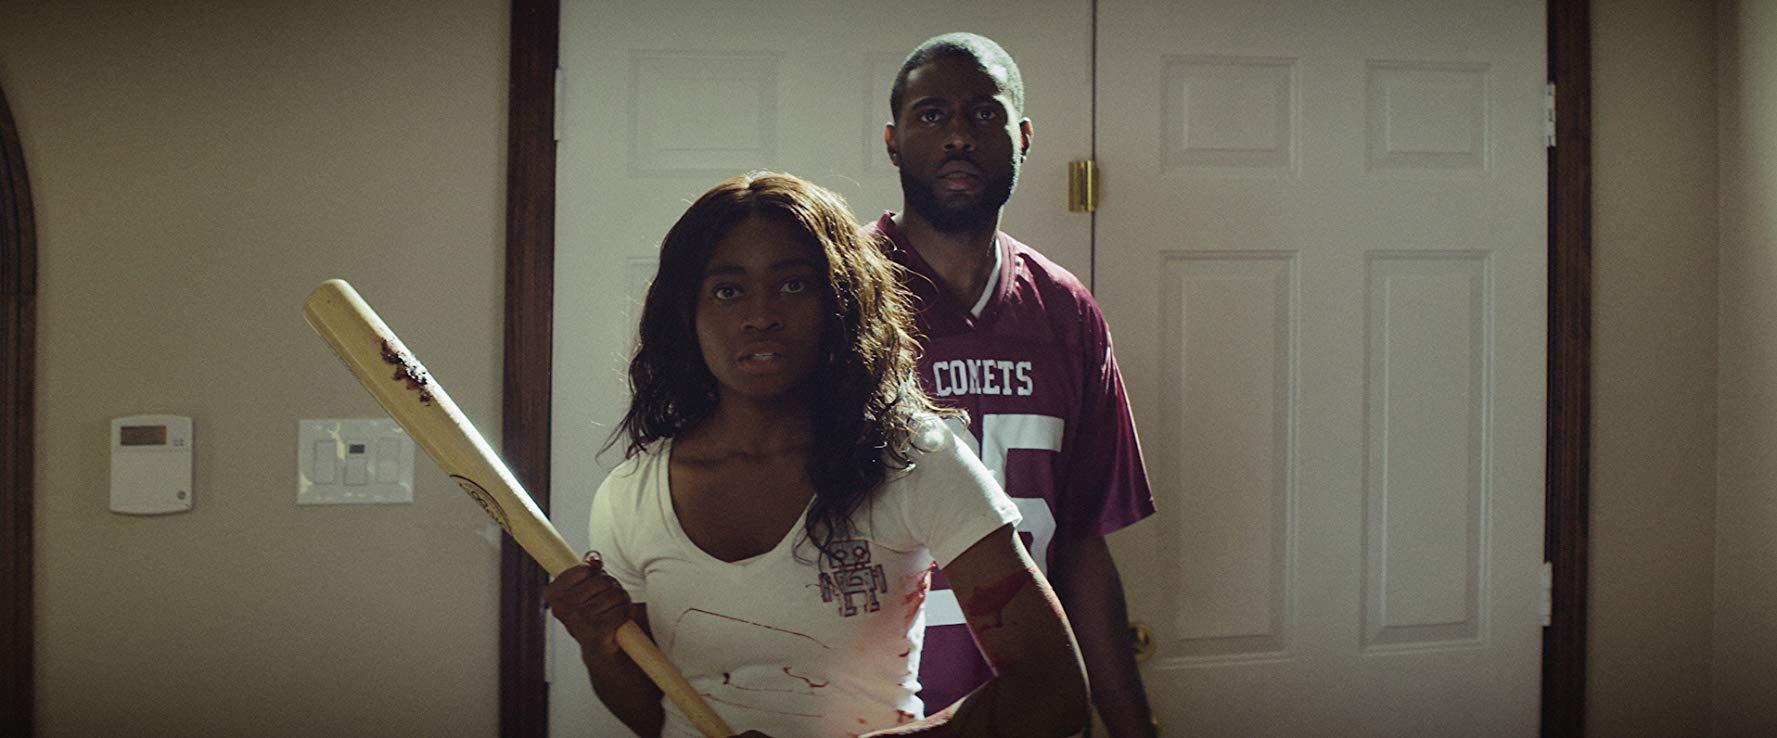 [Toronto After Dark] Short Film Reviews